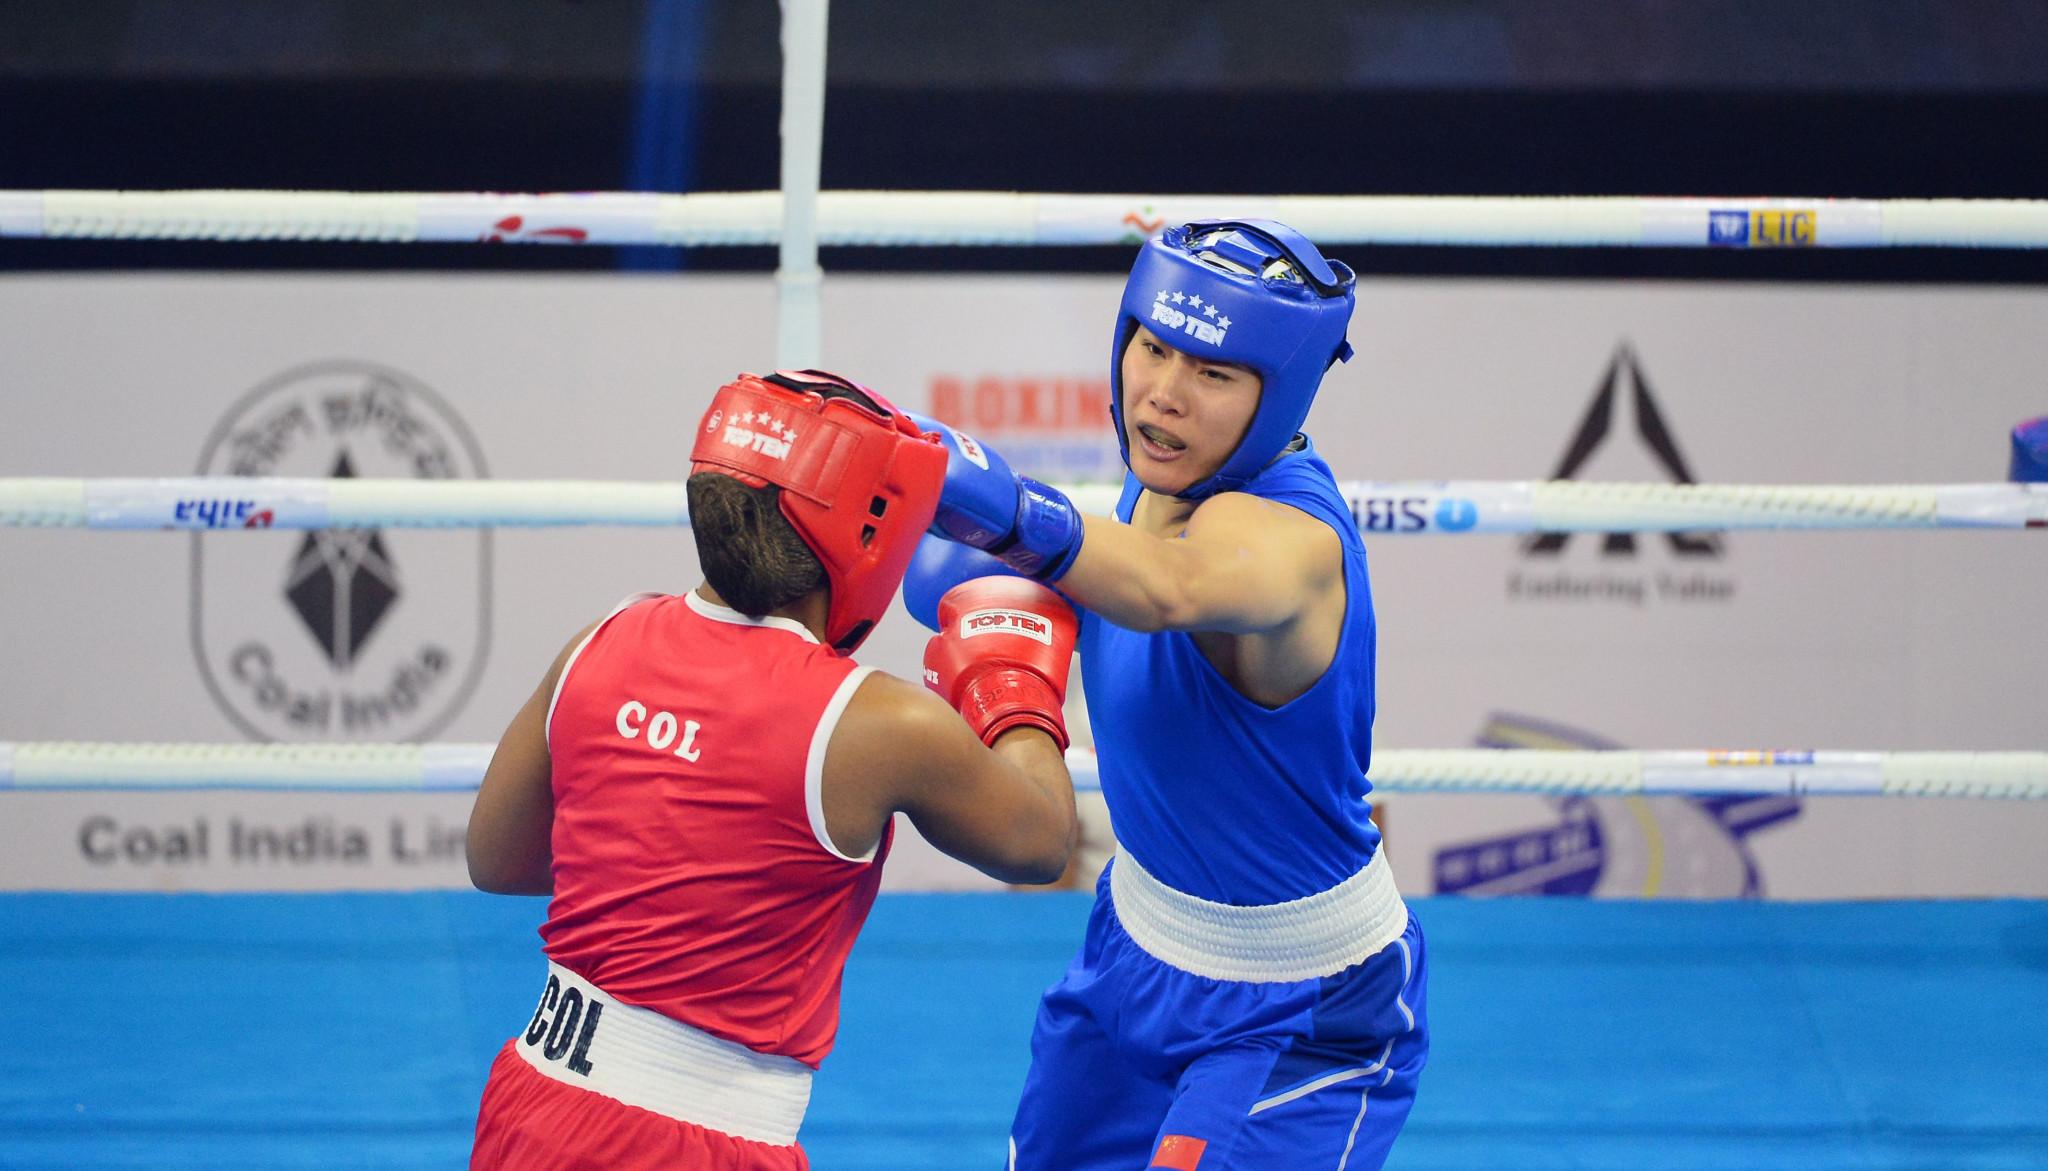 AIBA plans global celebration for International Boxing Day